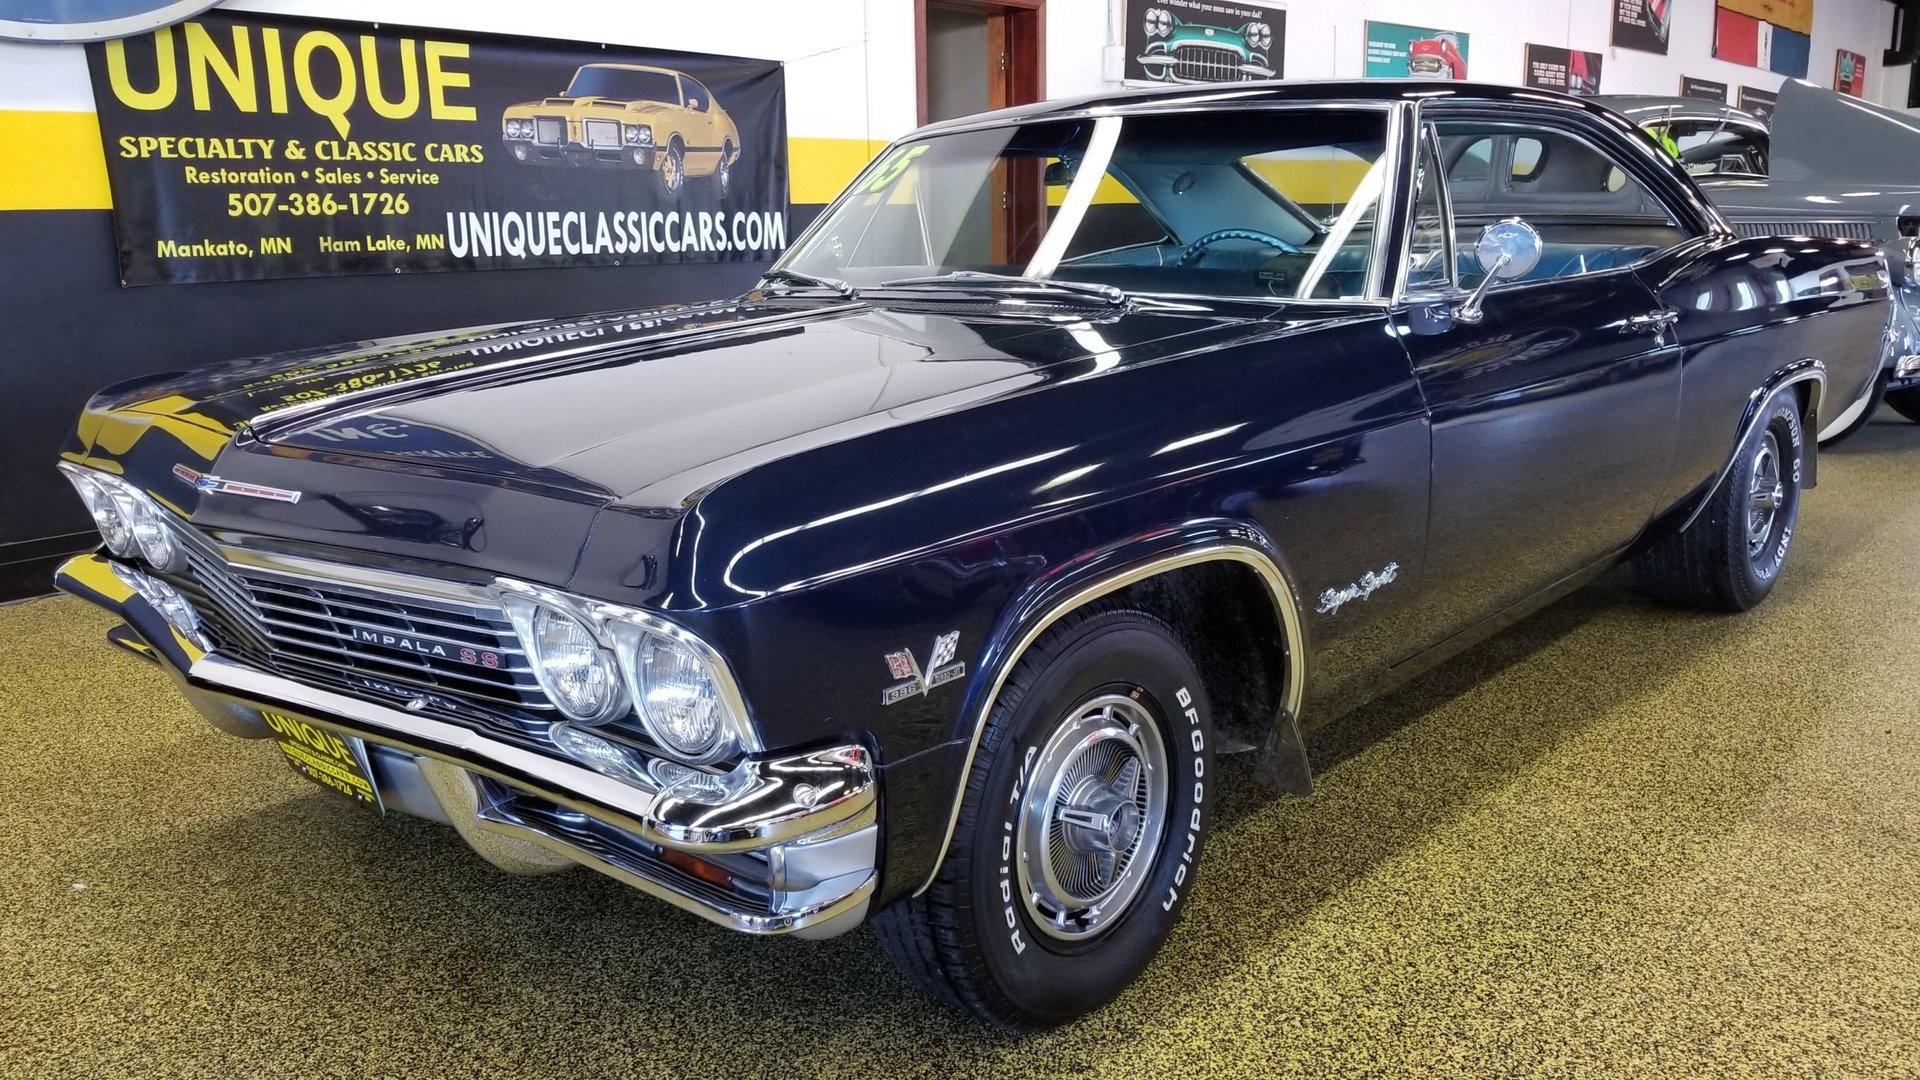 1965 Chevrolet Impala SS 396 2dr Hardtop for sale #99415 | MCG